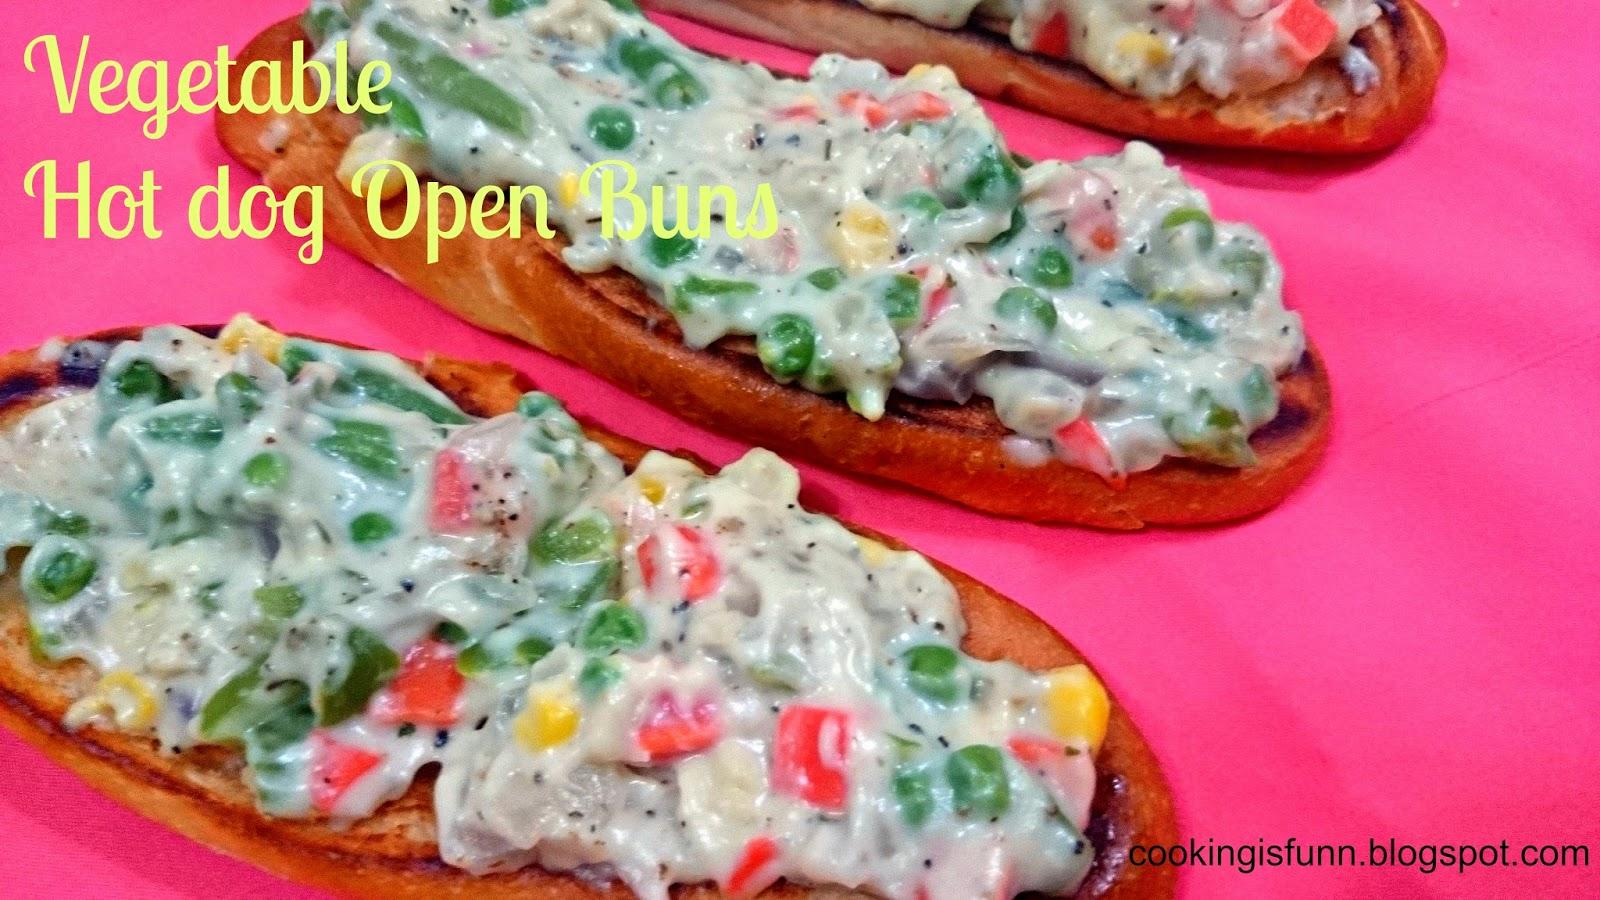 Cookingisfunn: Vegetable Open Hot Dog Buns  Cookingisfunn: ...